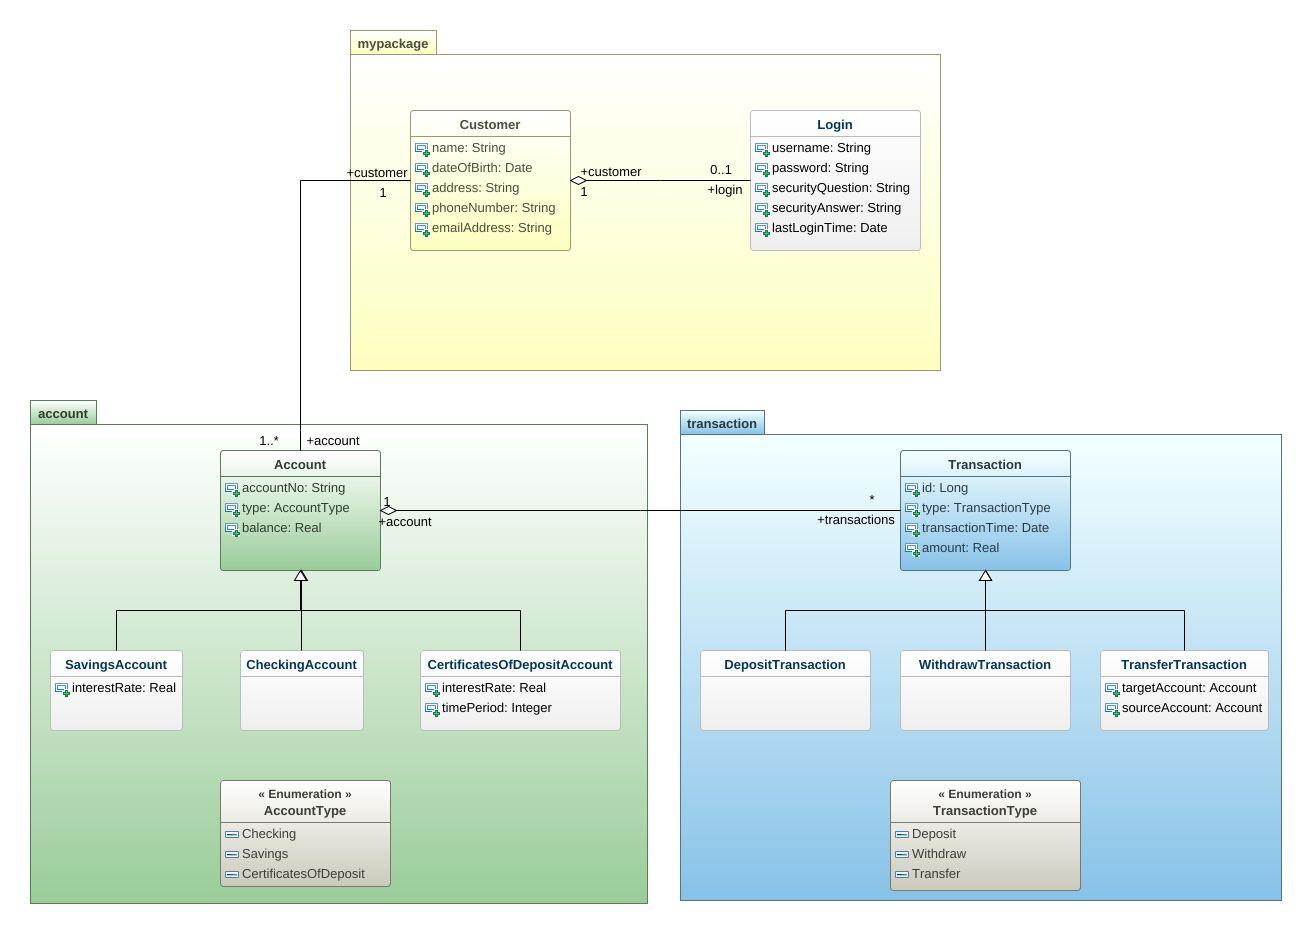 banking system uml diagram   banking system uml example   uml    download jpeg  bankingmanagementsystemdiag